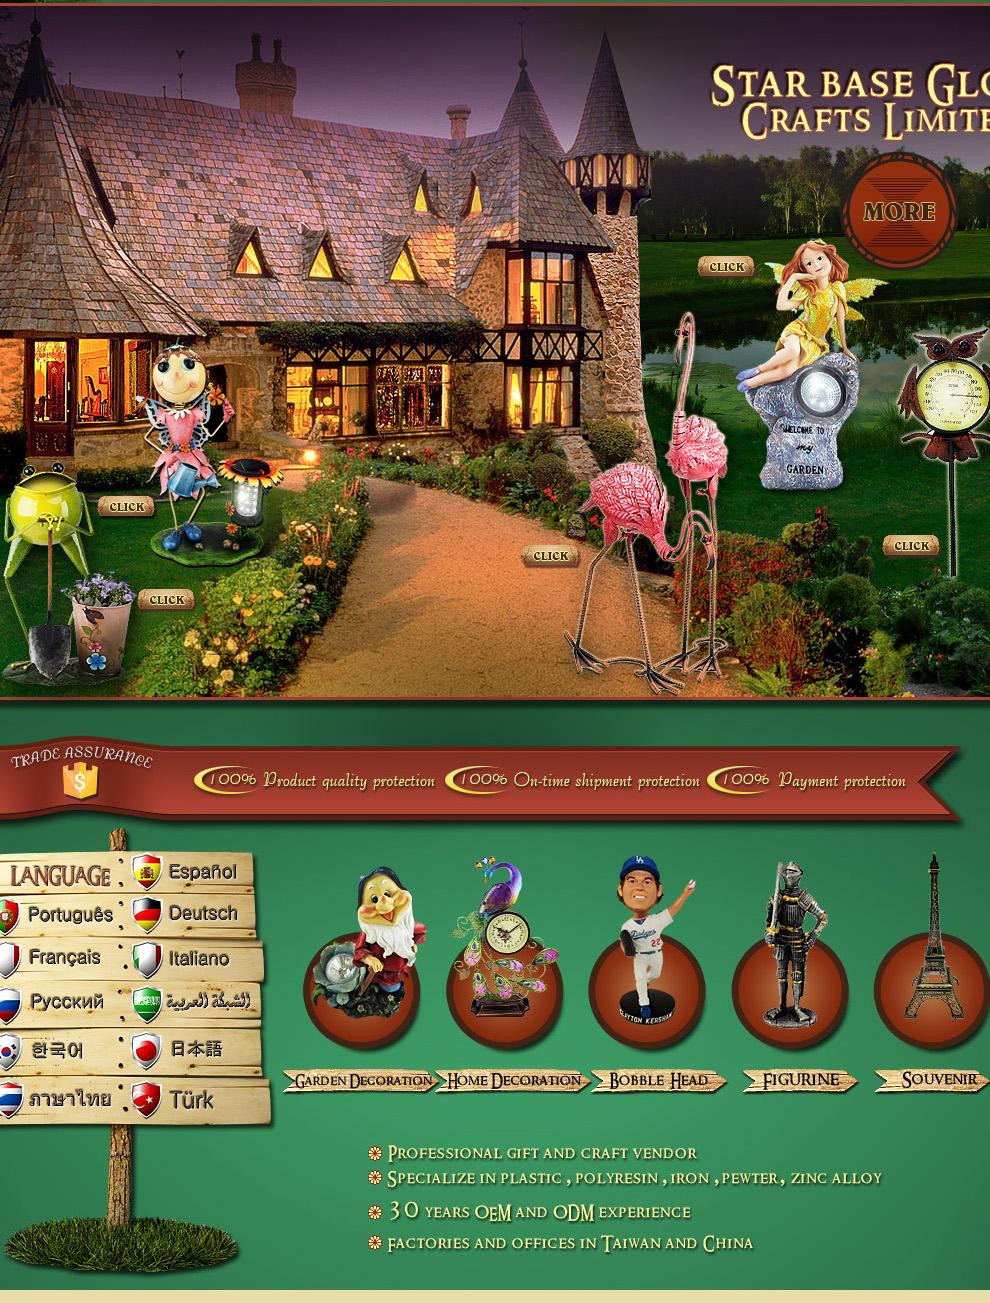 Zhangzhou star base global crafts limited   resin crafts,metal crafts